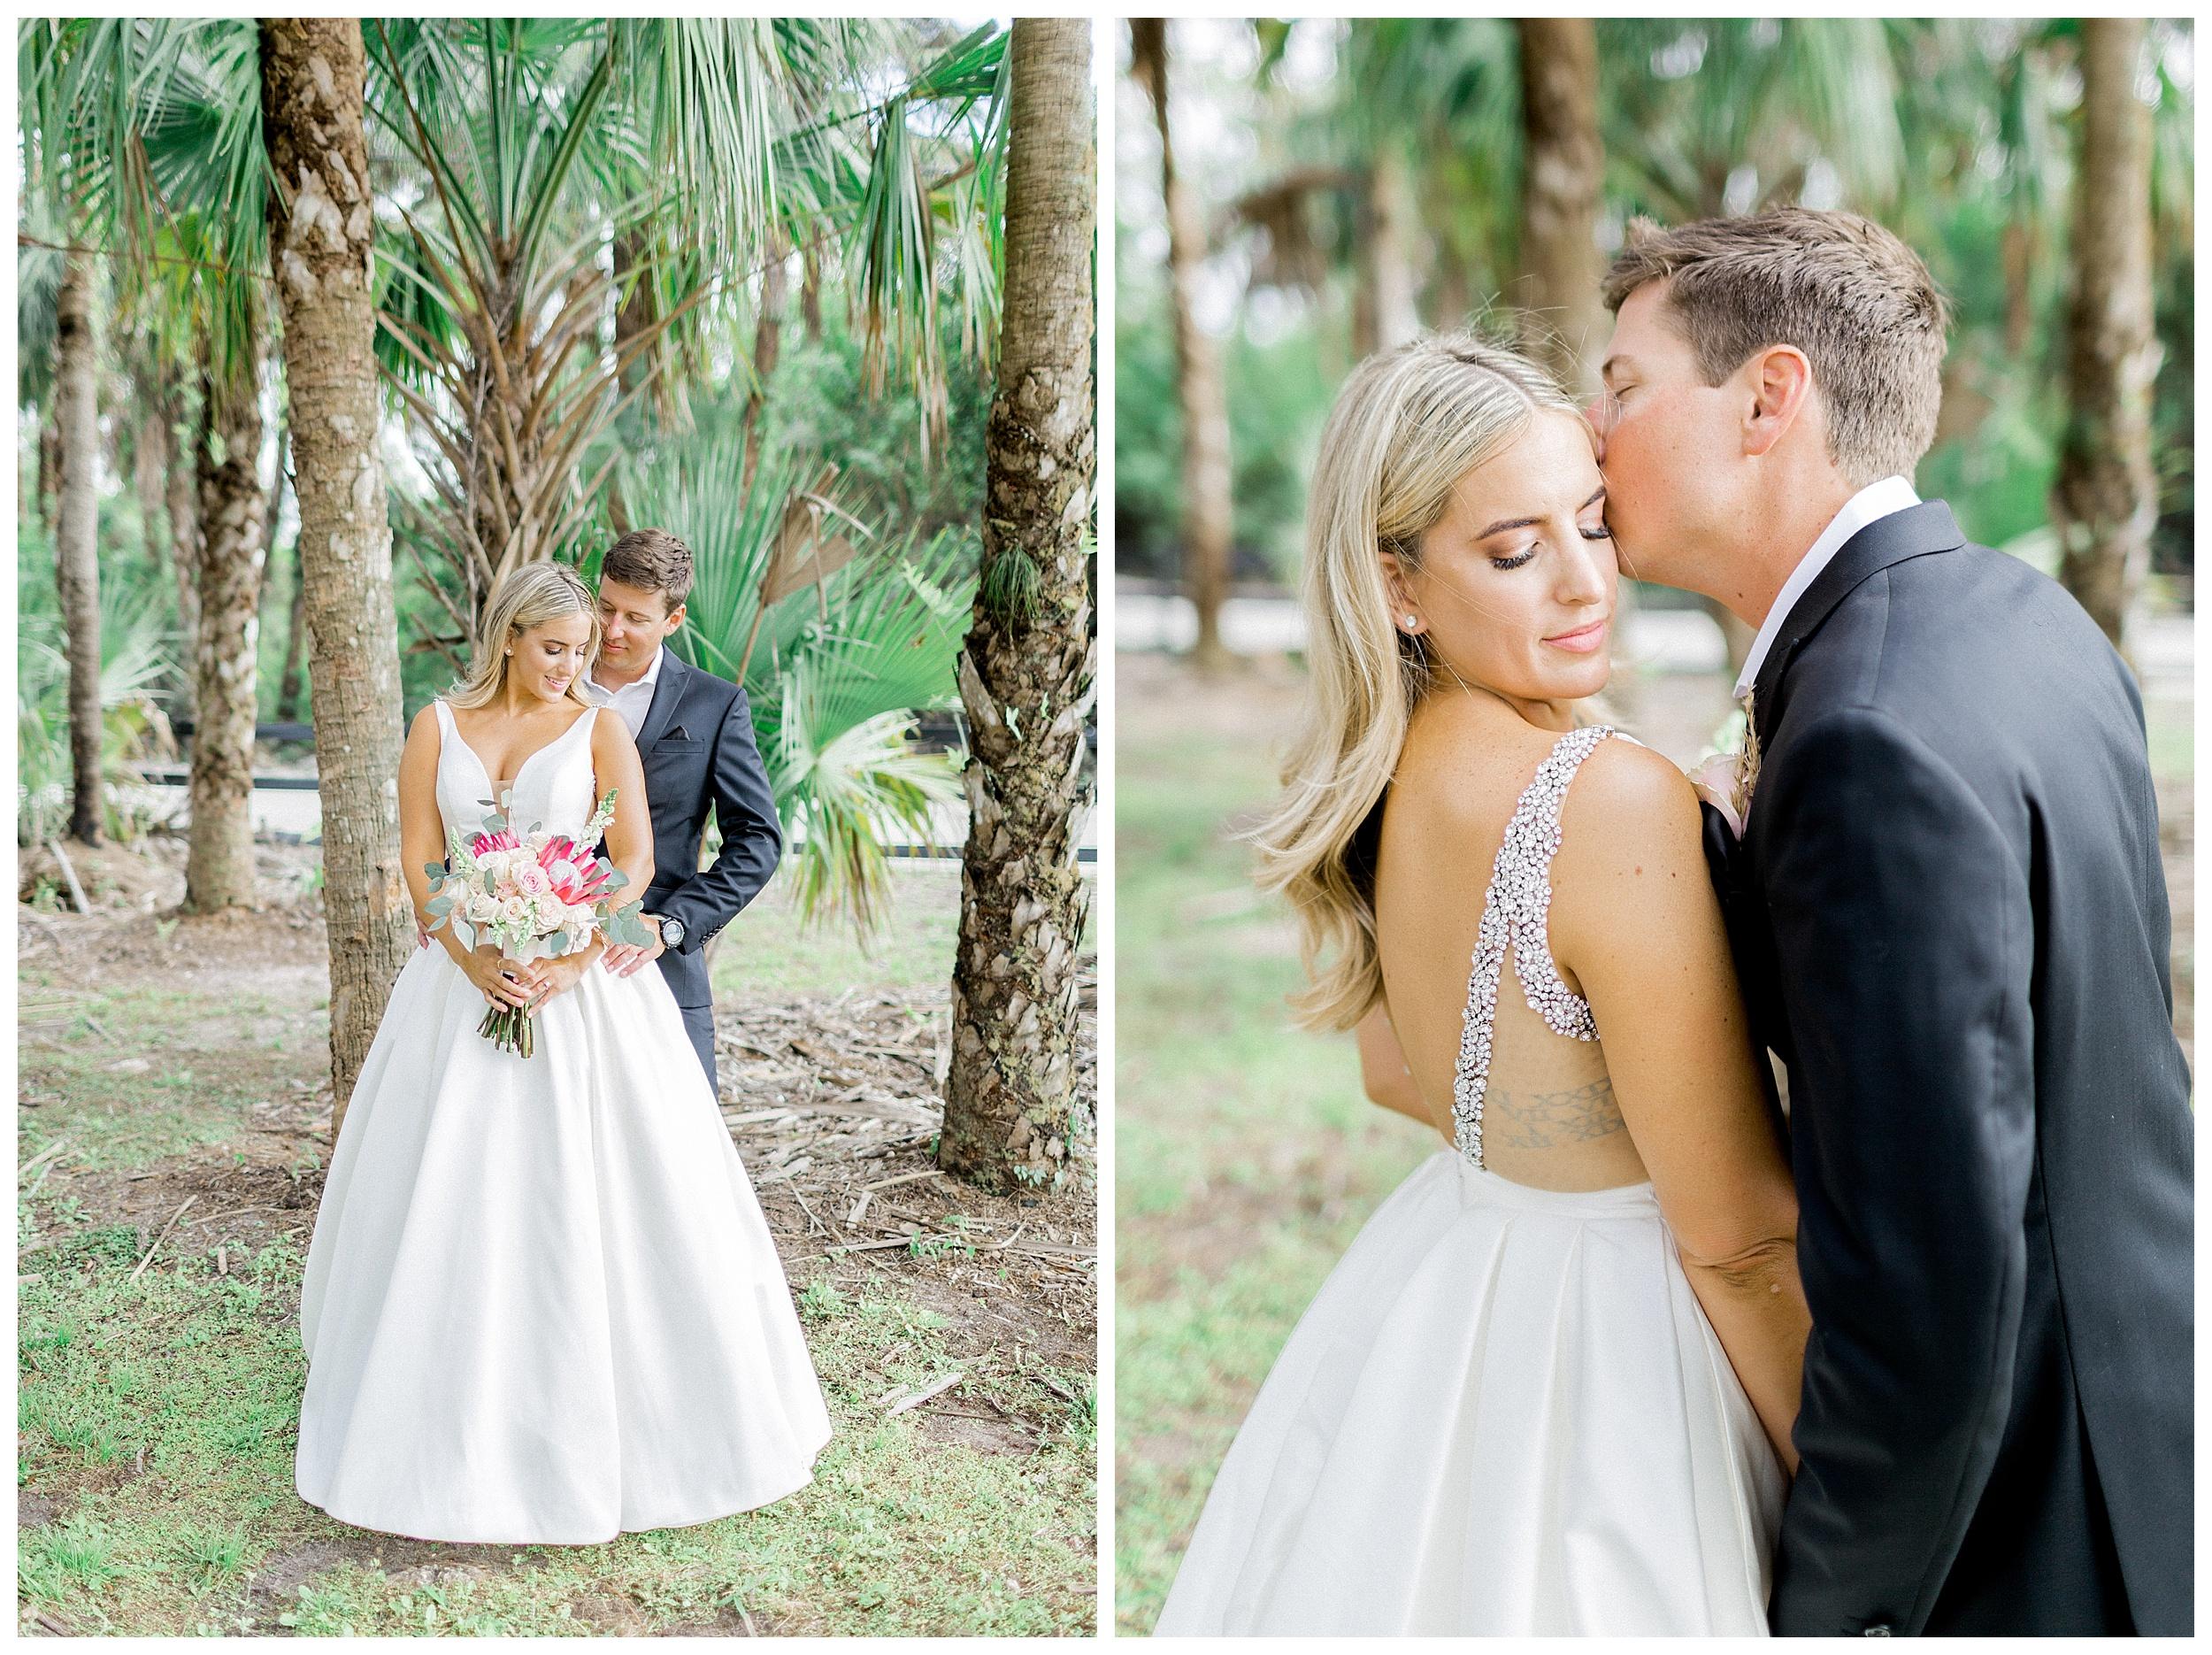 South Florida Wedding Photographer Kir Tuben_0043.jpg